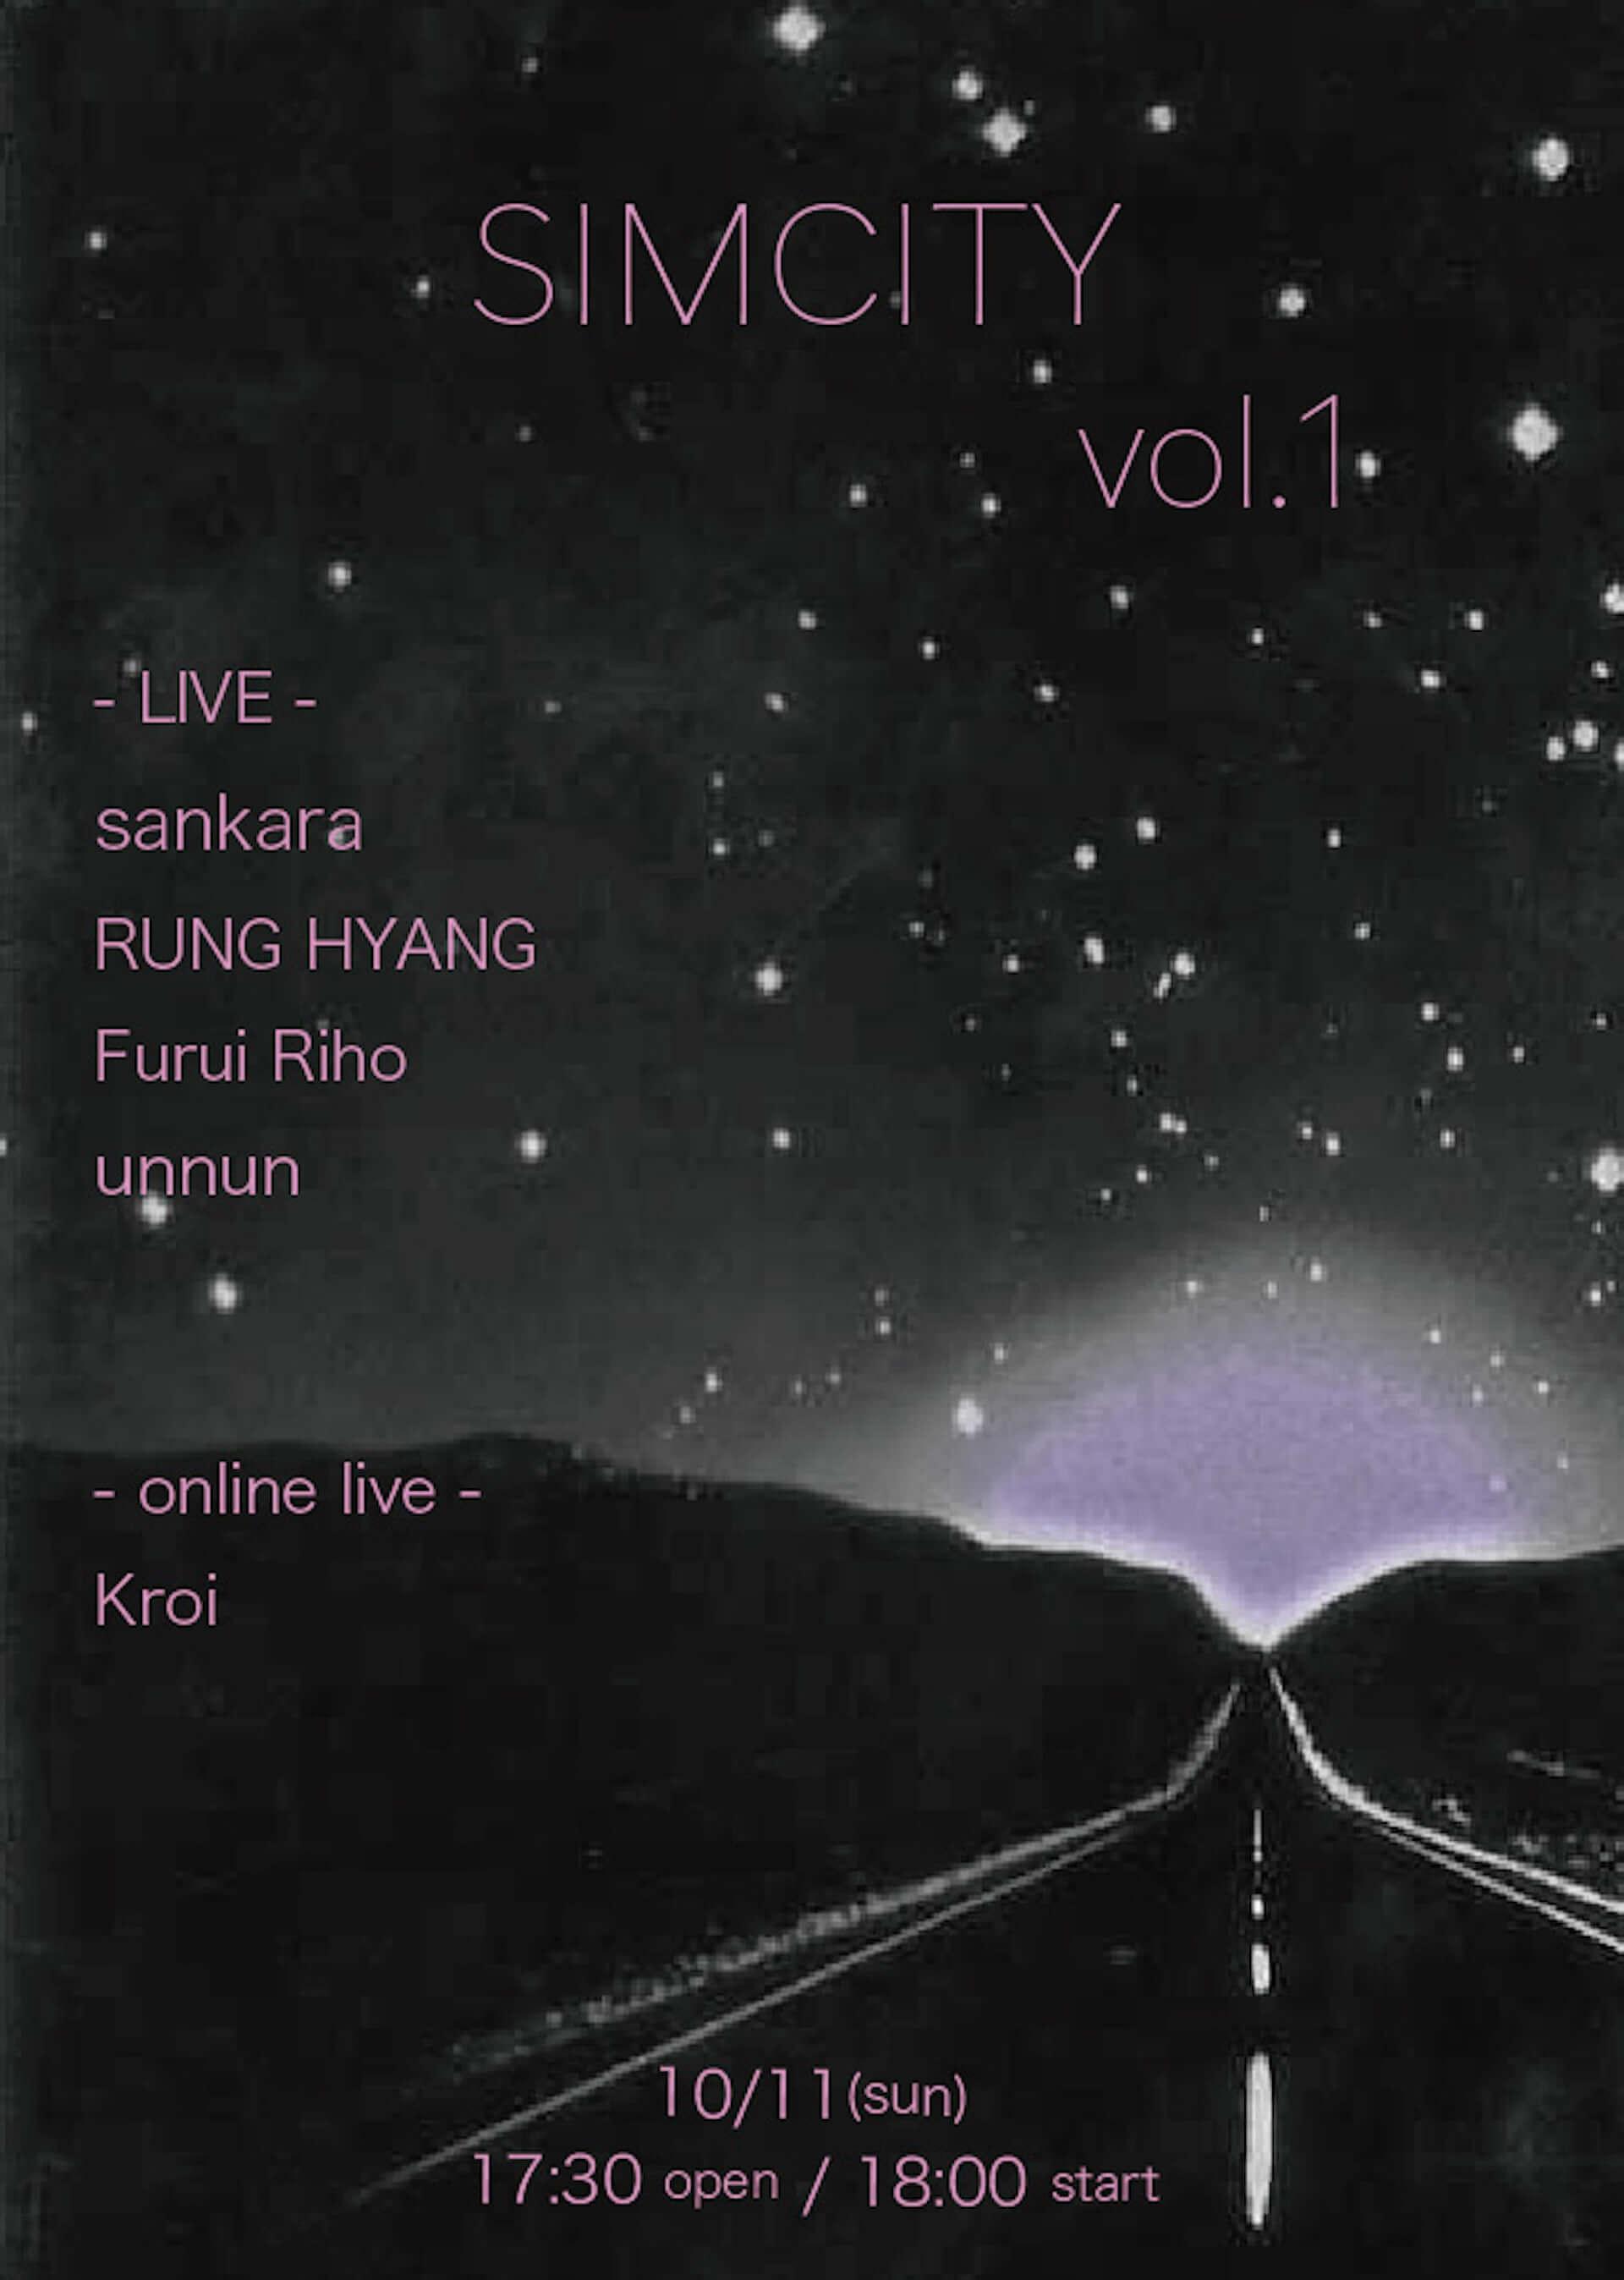 sankaraが新たなイベント<SIMCITY>を始動!第1回にKroi、unnun、Furui Riho、RUNG HYANGが出演 music200901_sankara-simcity_6-1920x2695